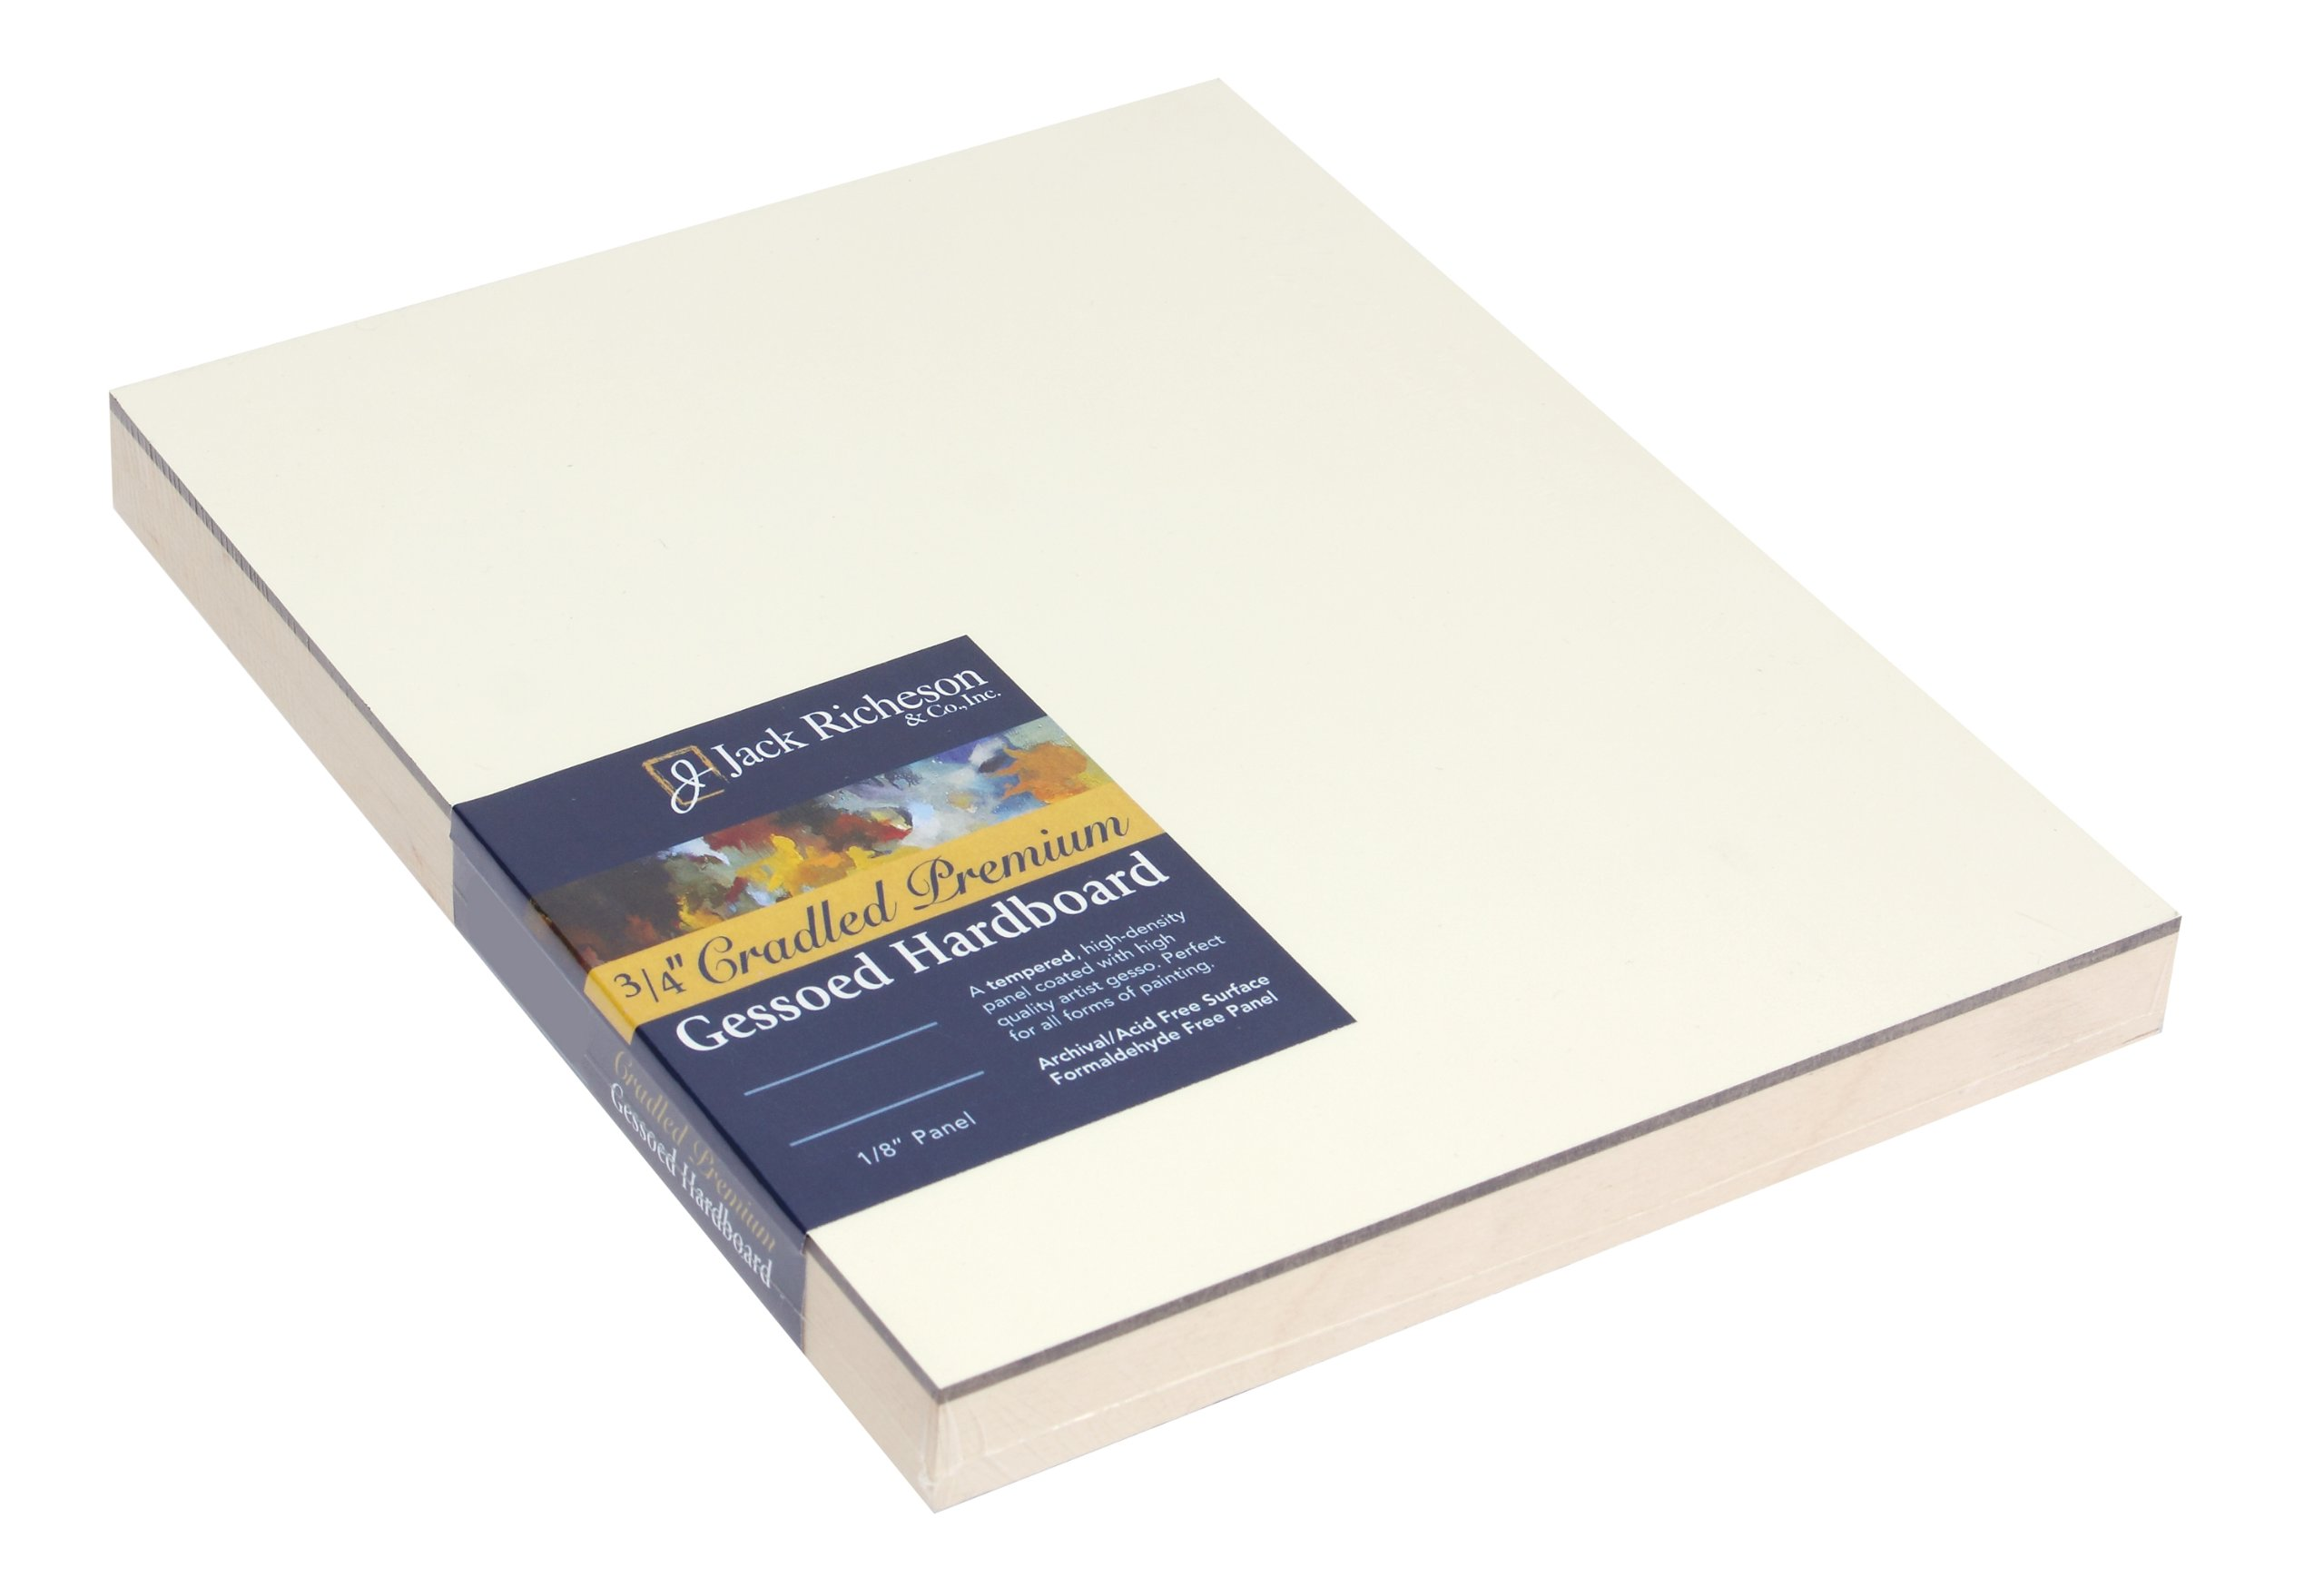 Jack Richeson 3/4-Inch Premium Tempered Gessoed Hardboard Panel, 8-Inch by 8-Inch by Jack Richeson